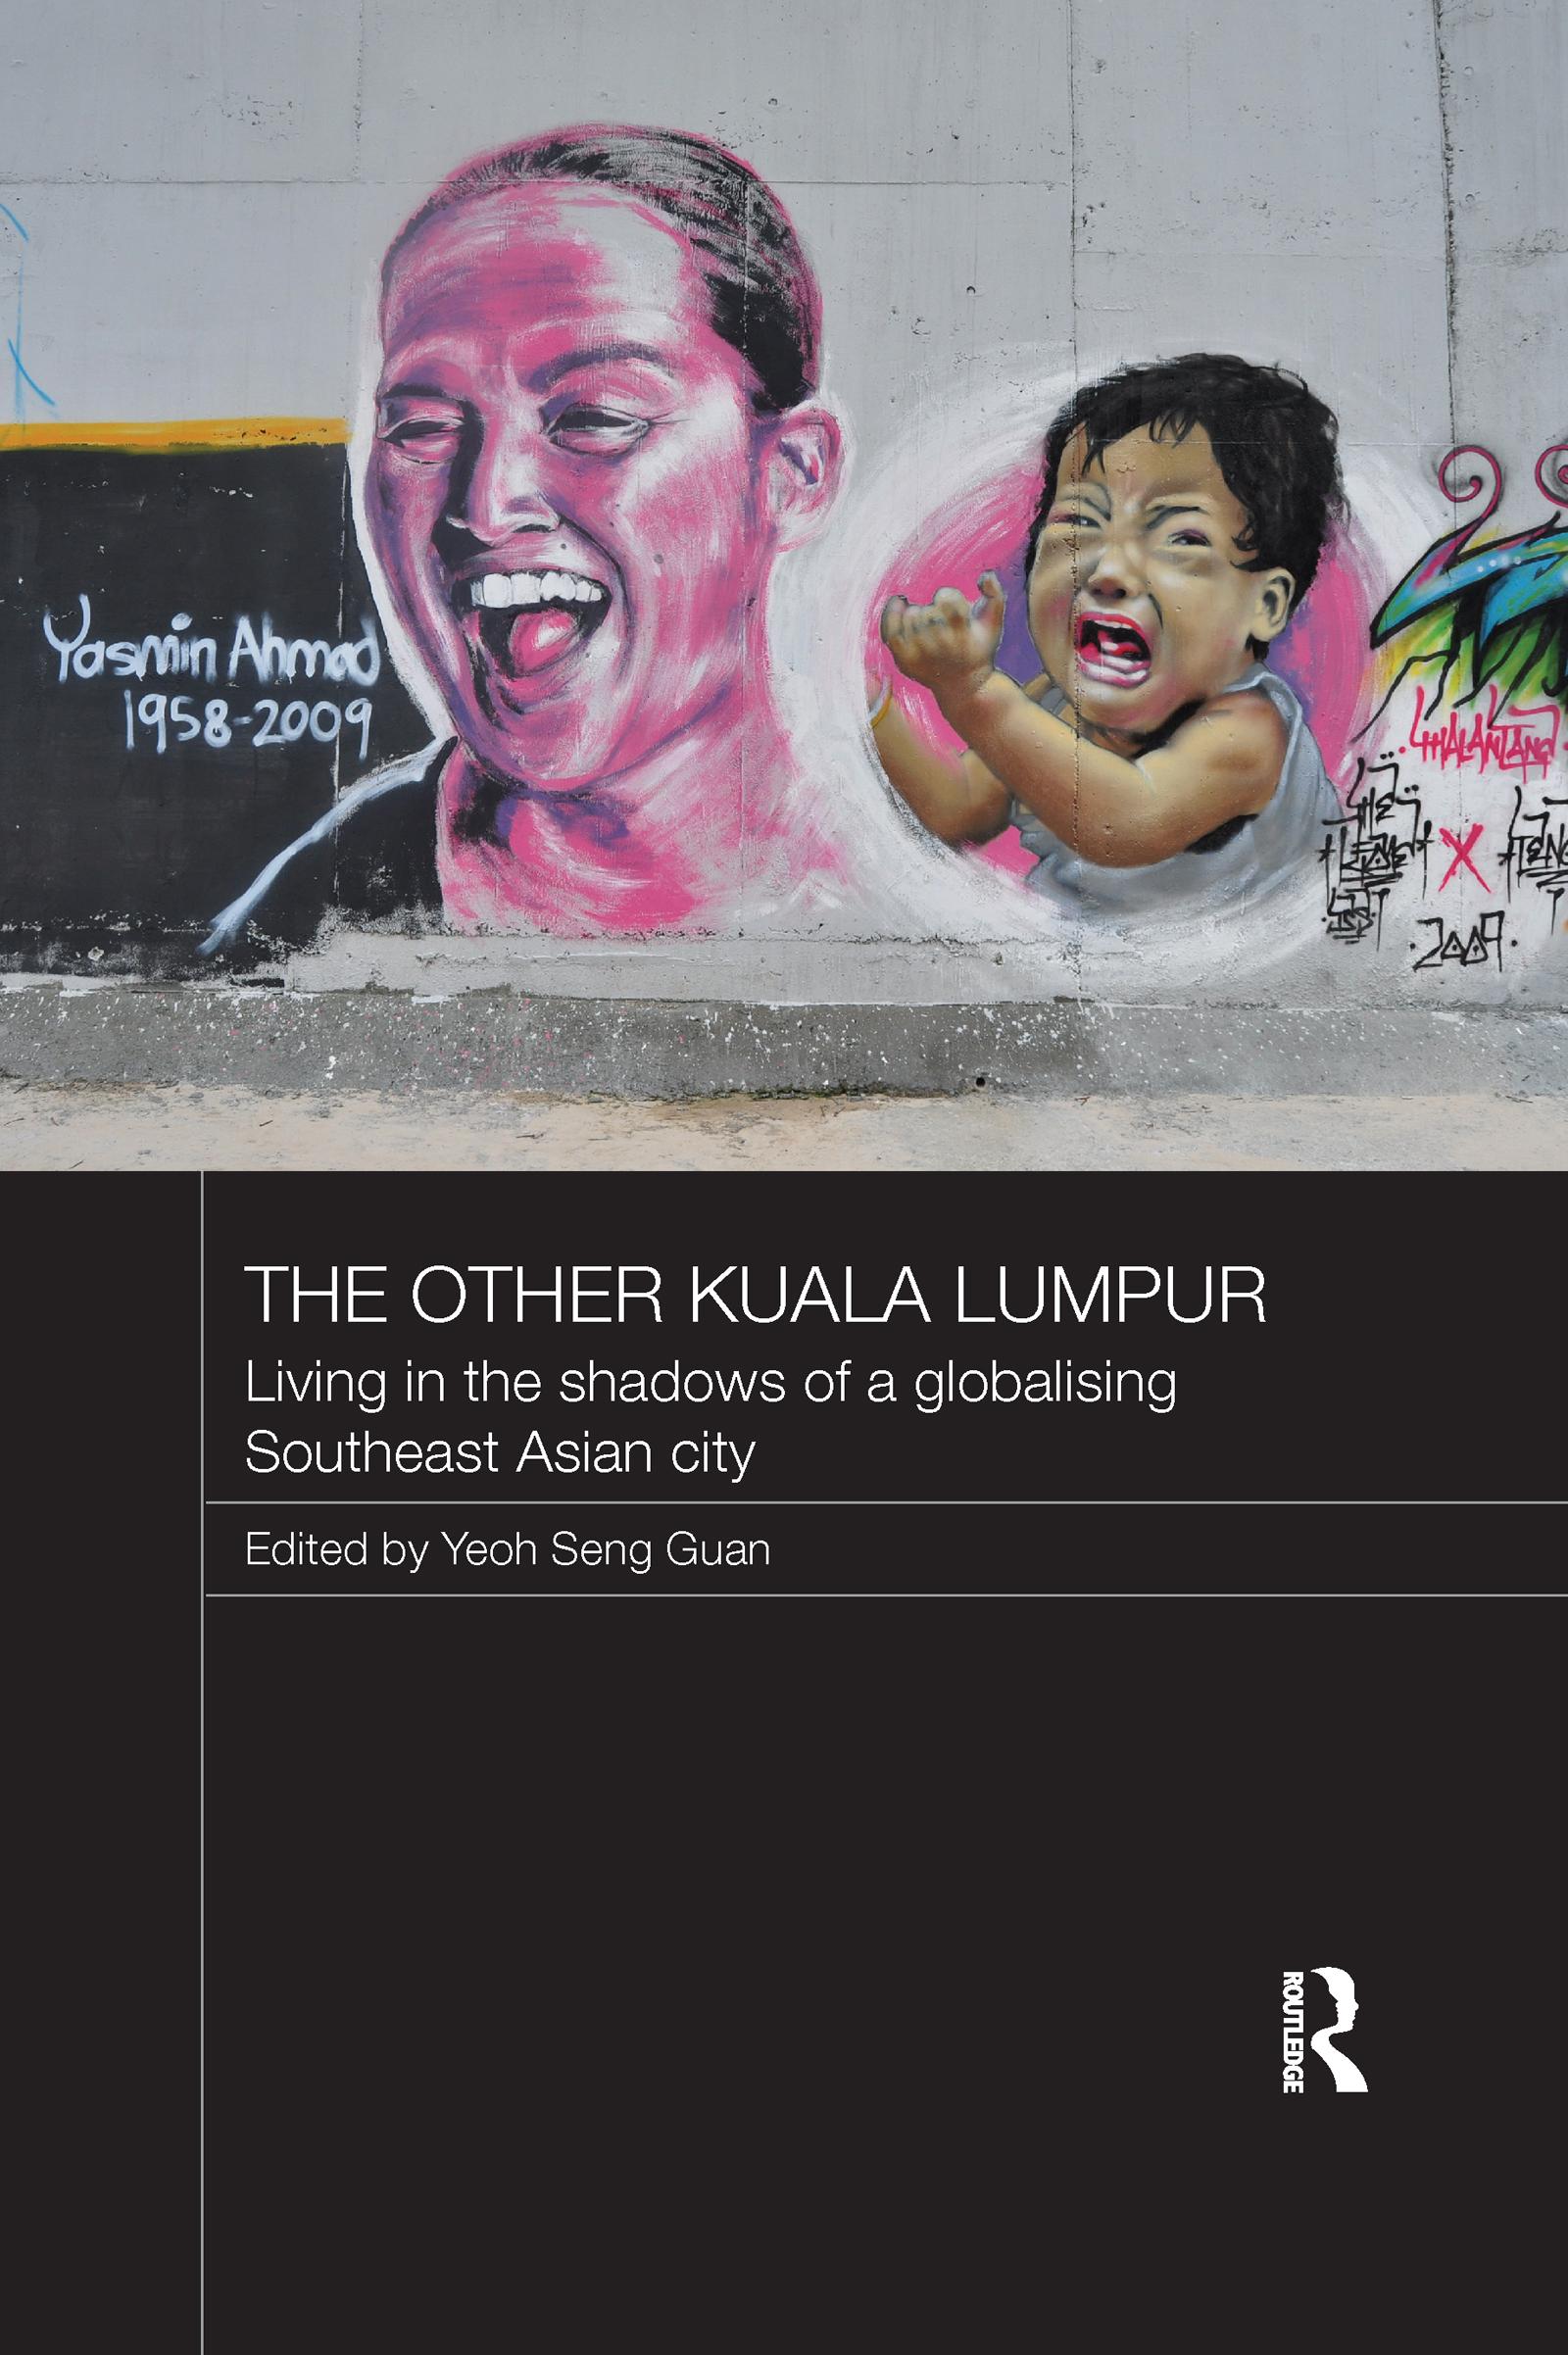 The Other Kuala Lumpur